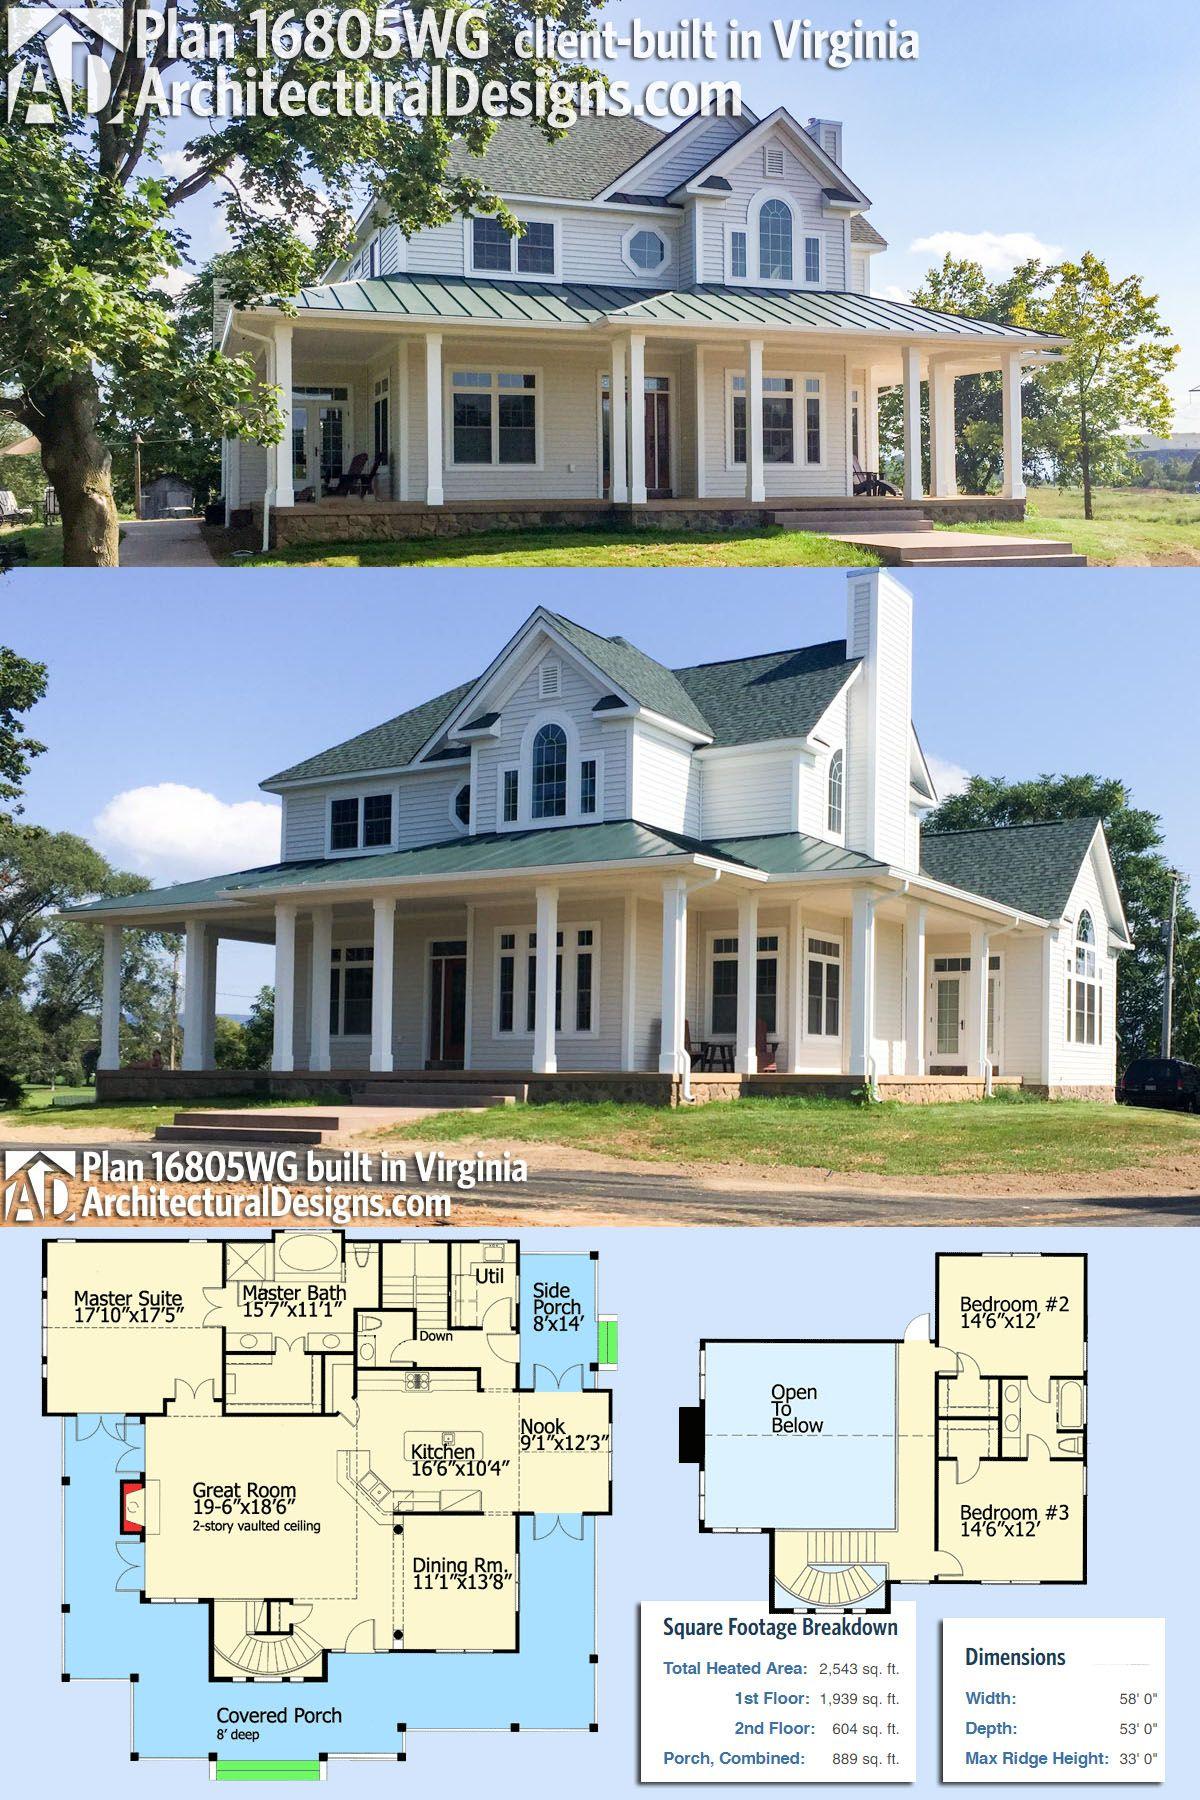 Plan 16805wg Country Farmhouse With Wraparound Porch Porch